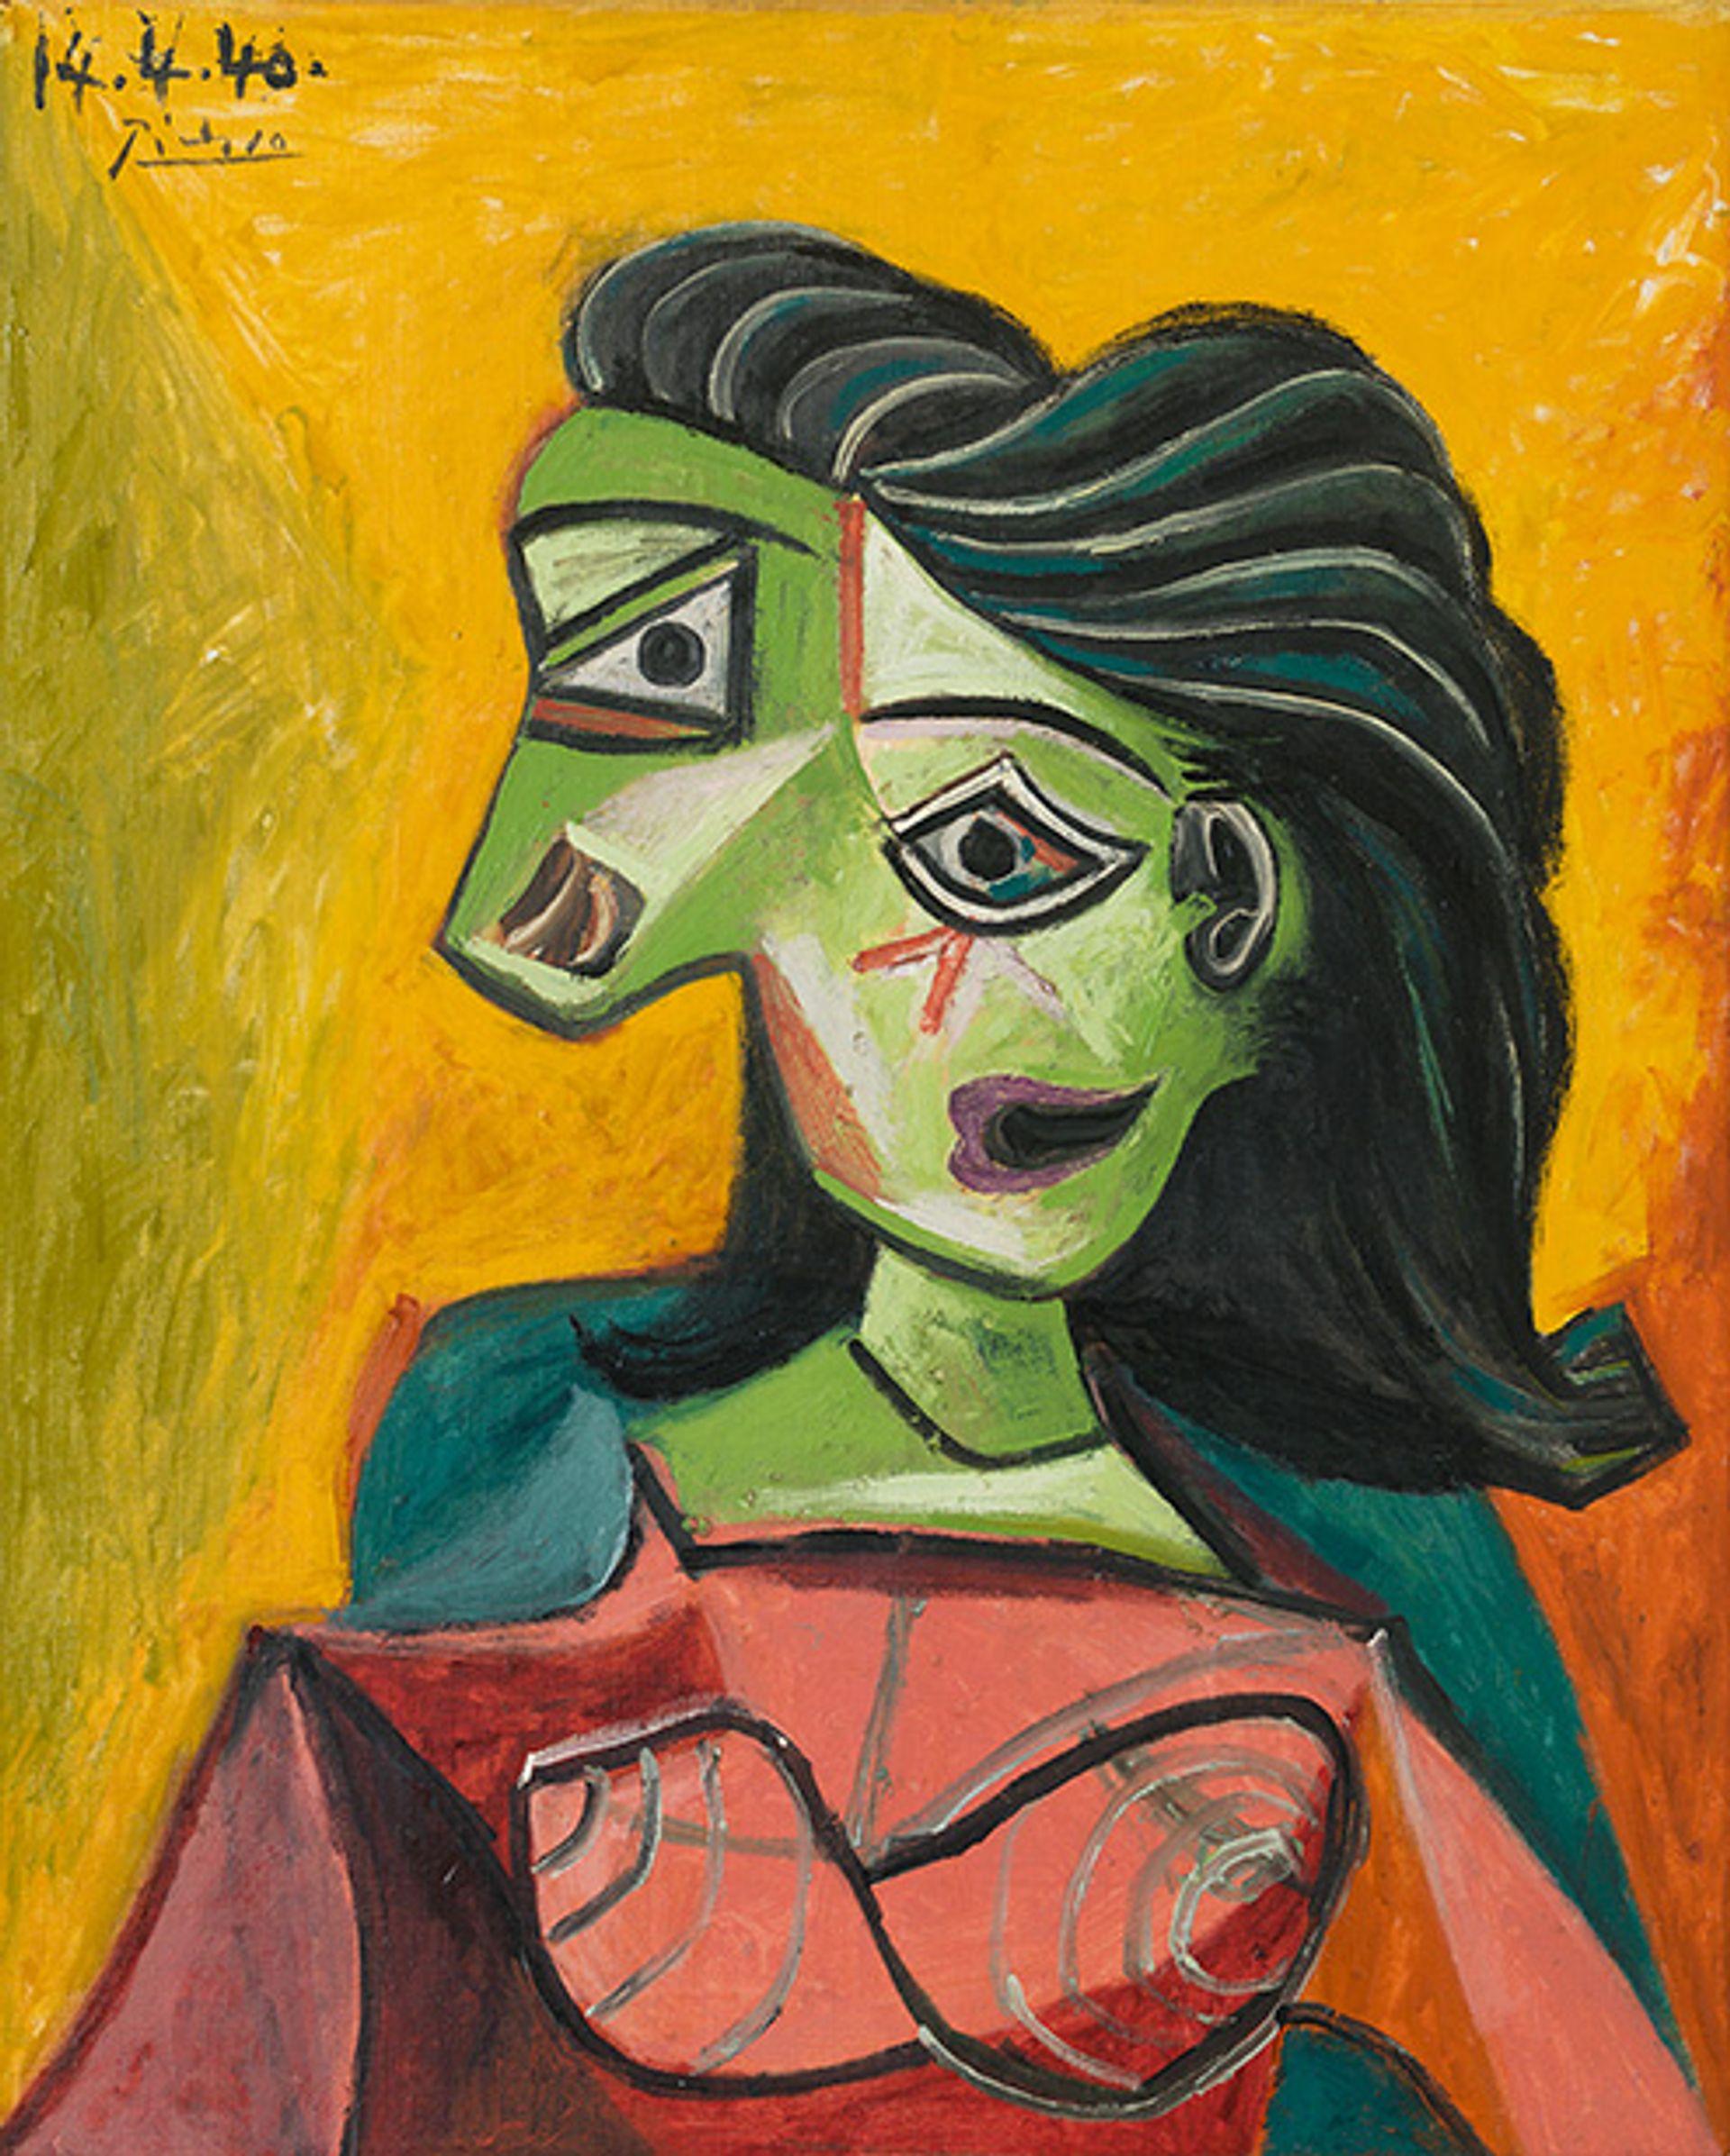 Picasso's Buste de femme (Dora Maar), 1940 © 2019 Estate of Pablo Picasso/Artist Rights Society (ARS), New York. Photo: Erich Koyama. Courtesy Gagosian.